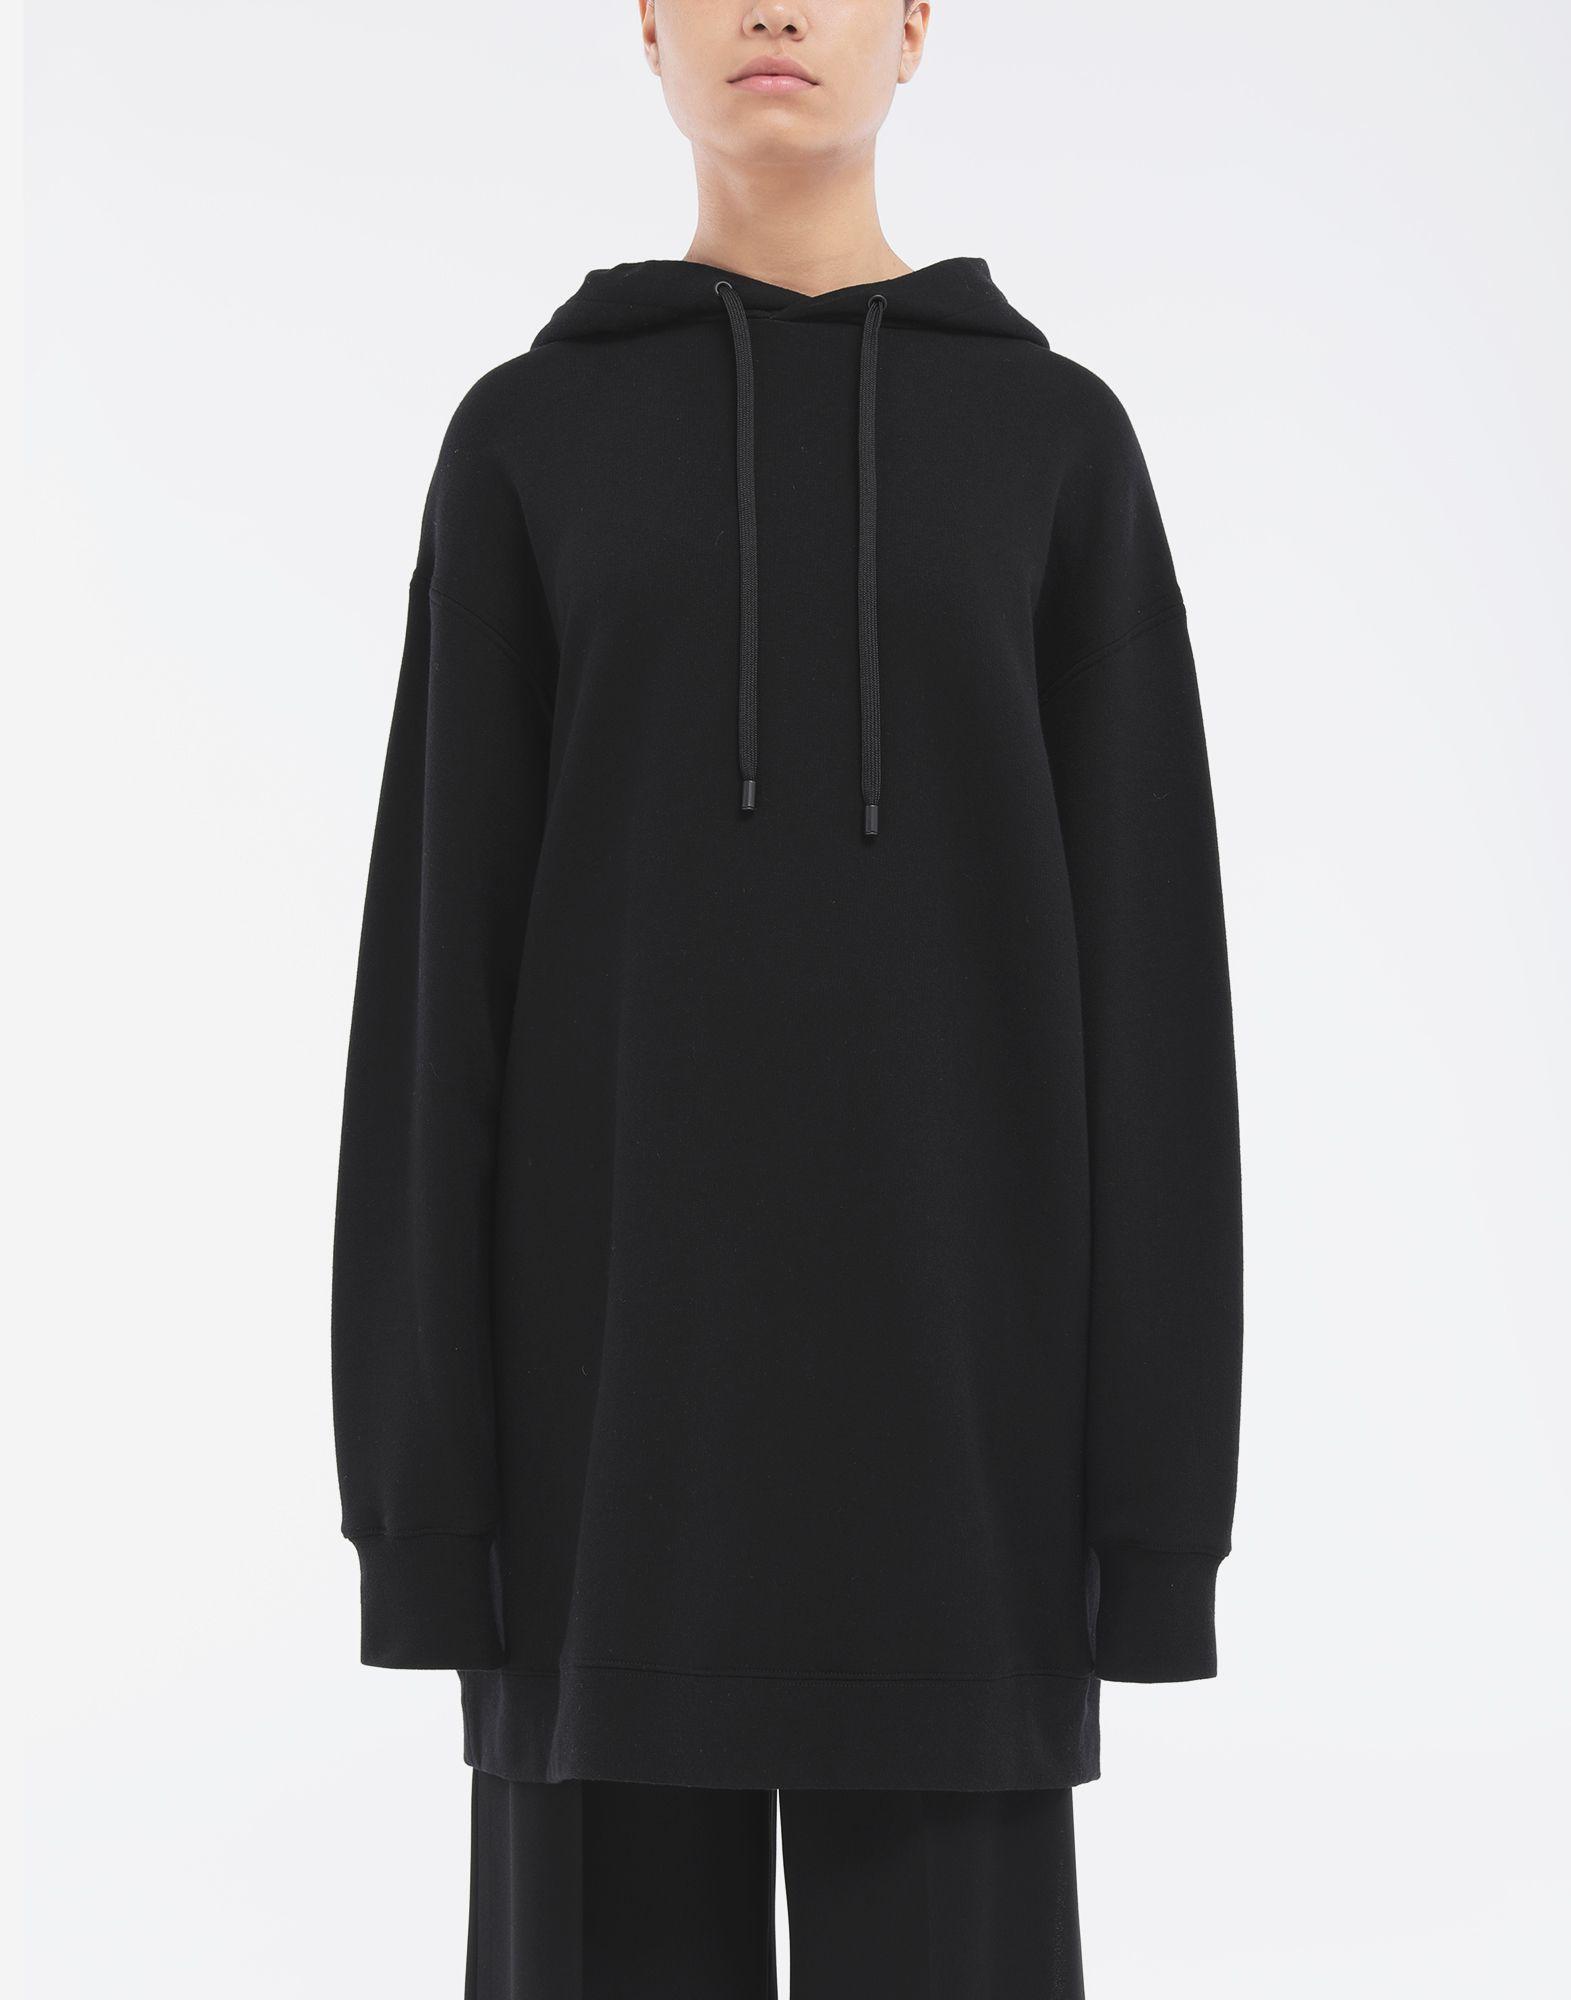 MAISON MARGIELA Long-line hooded sweatshirt Hooded sweatshirt Woman r